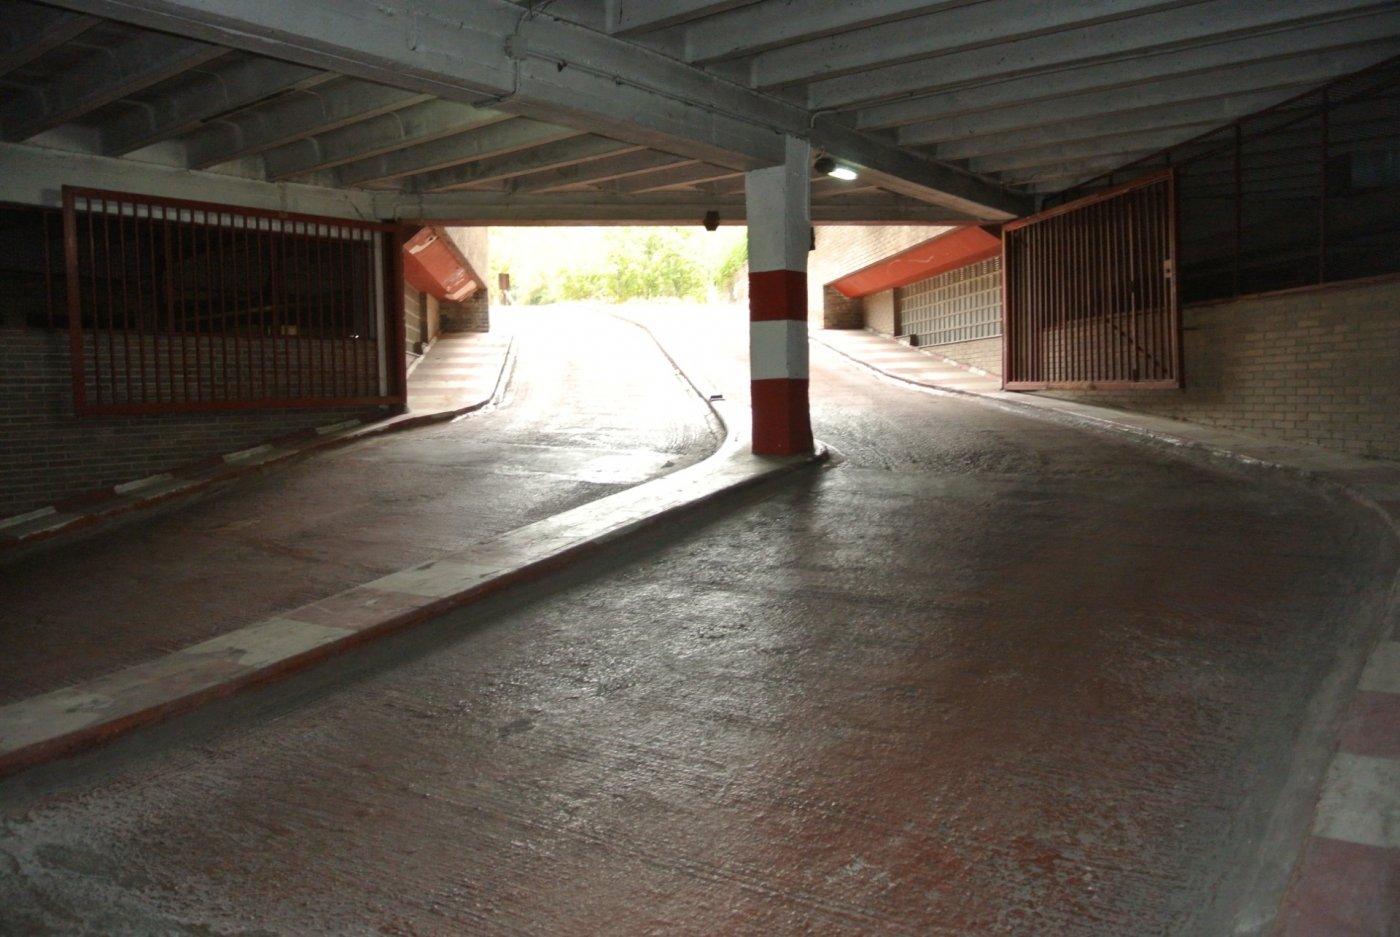 Plaza de garaje en tenor fleta - imagenInmueble2